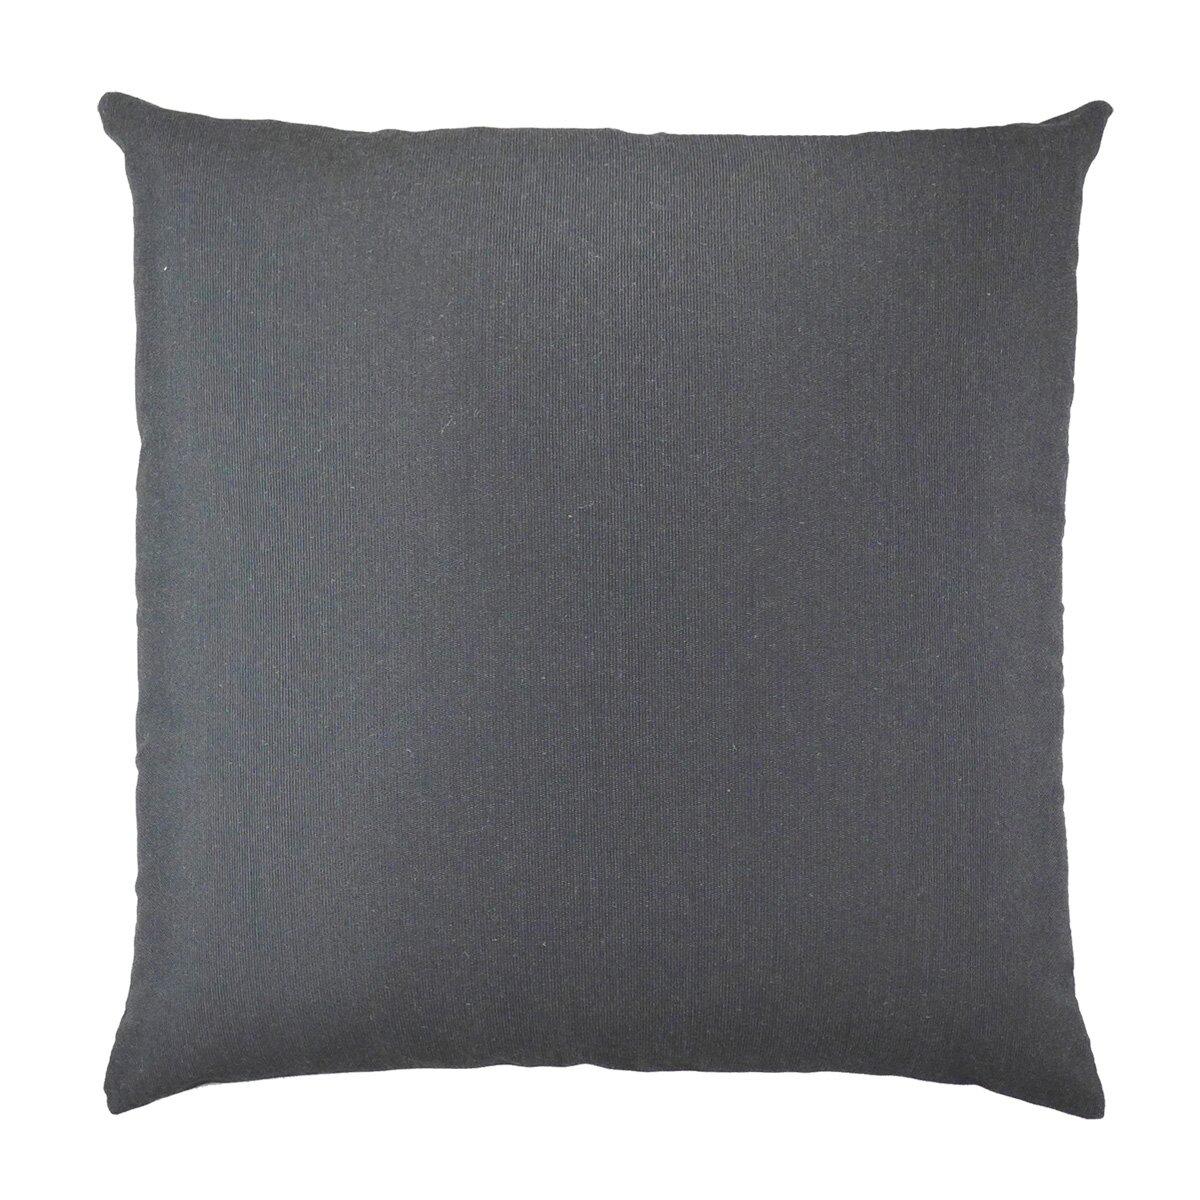 NECTARmodern Linked Embroidered Throw Pillow & Reviews Wayfair